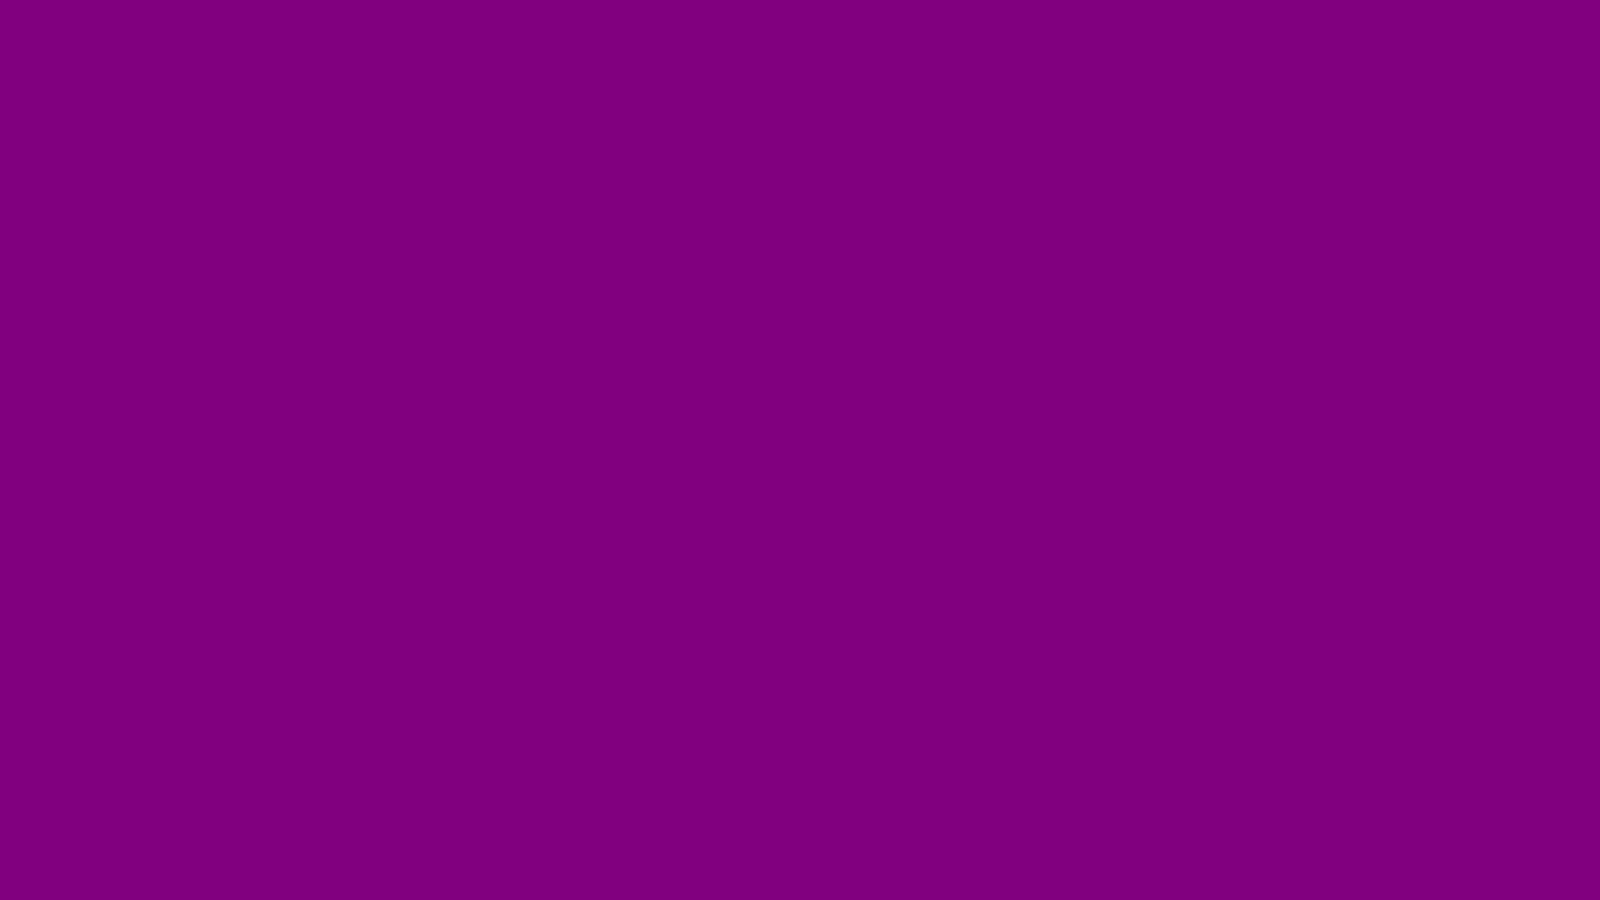 1600x900 Purple Web Solid Color Background